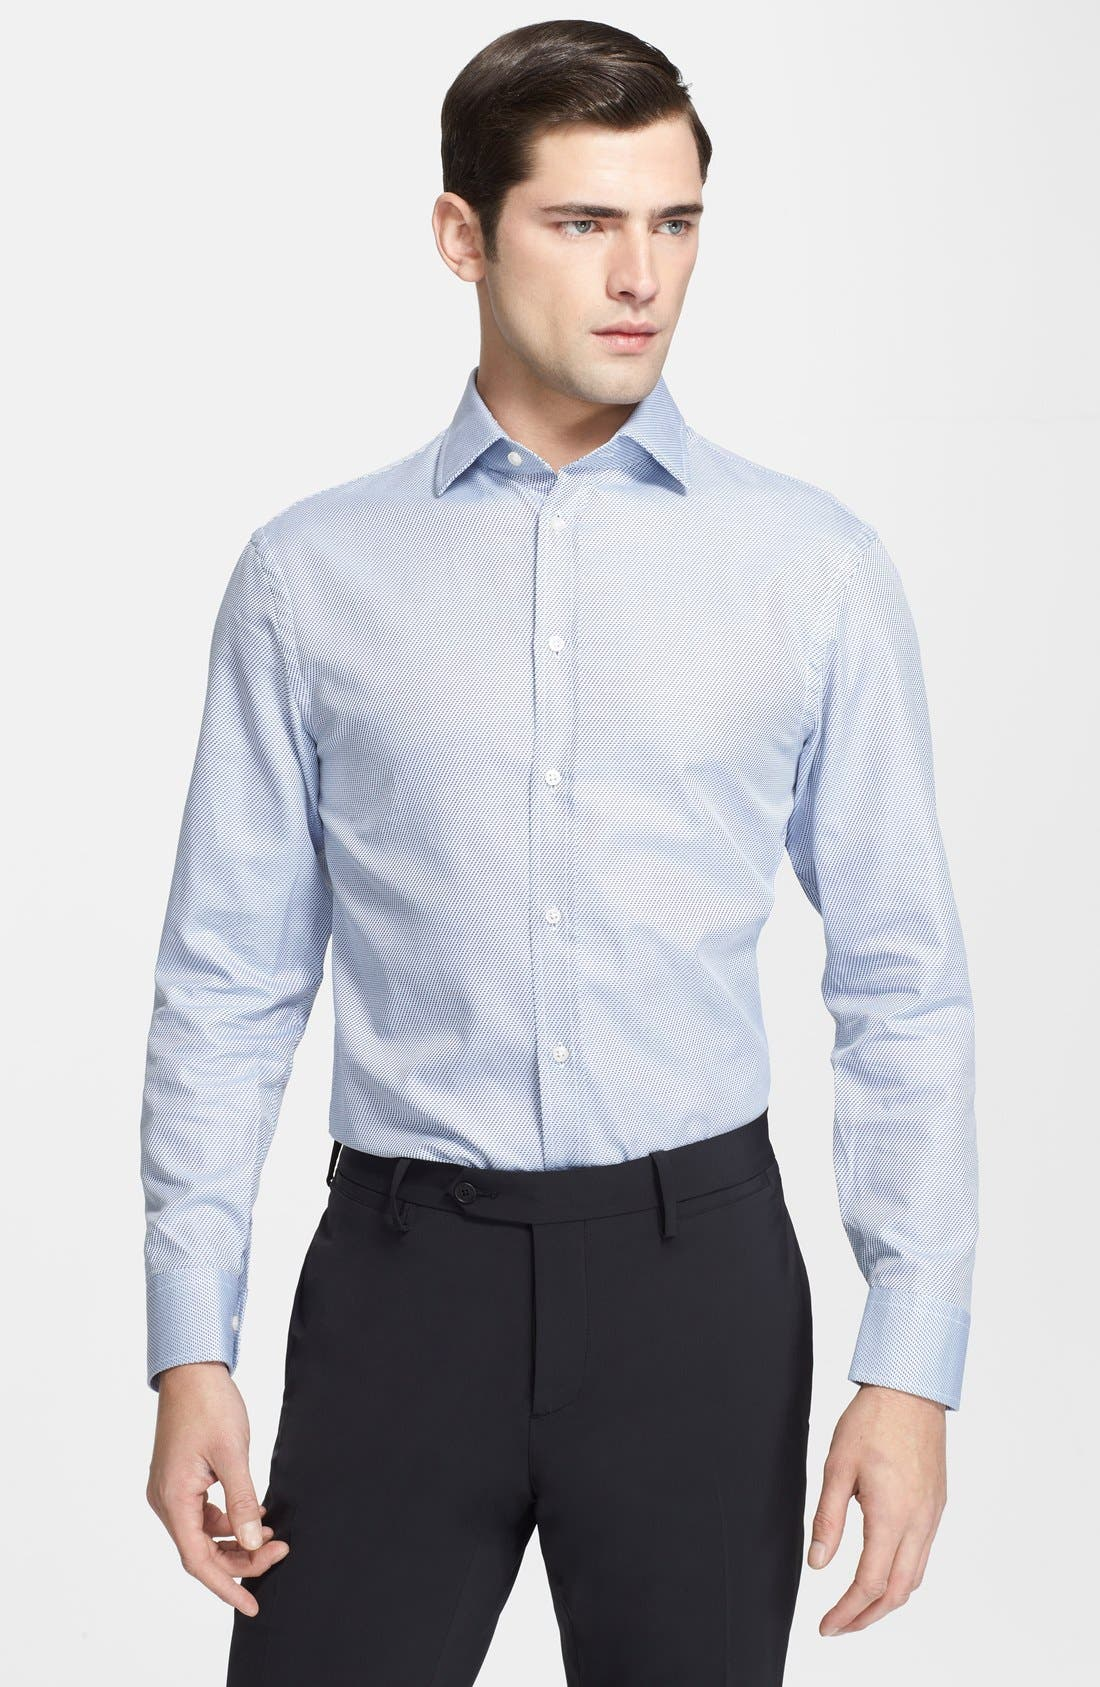 Alternate Image 1 Selected - Armani Collezioni Slim Fit Dress Shirt